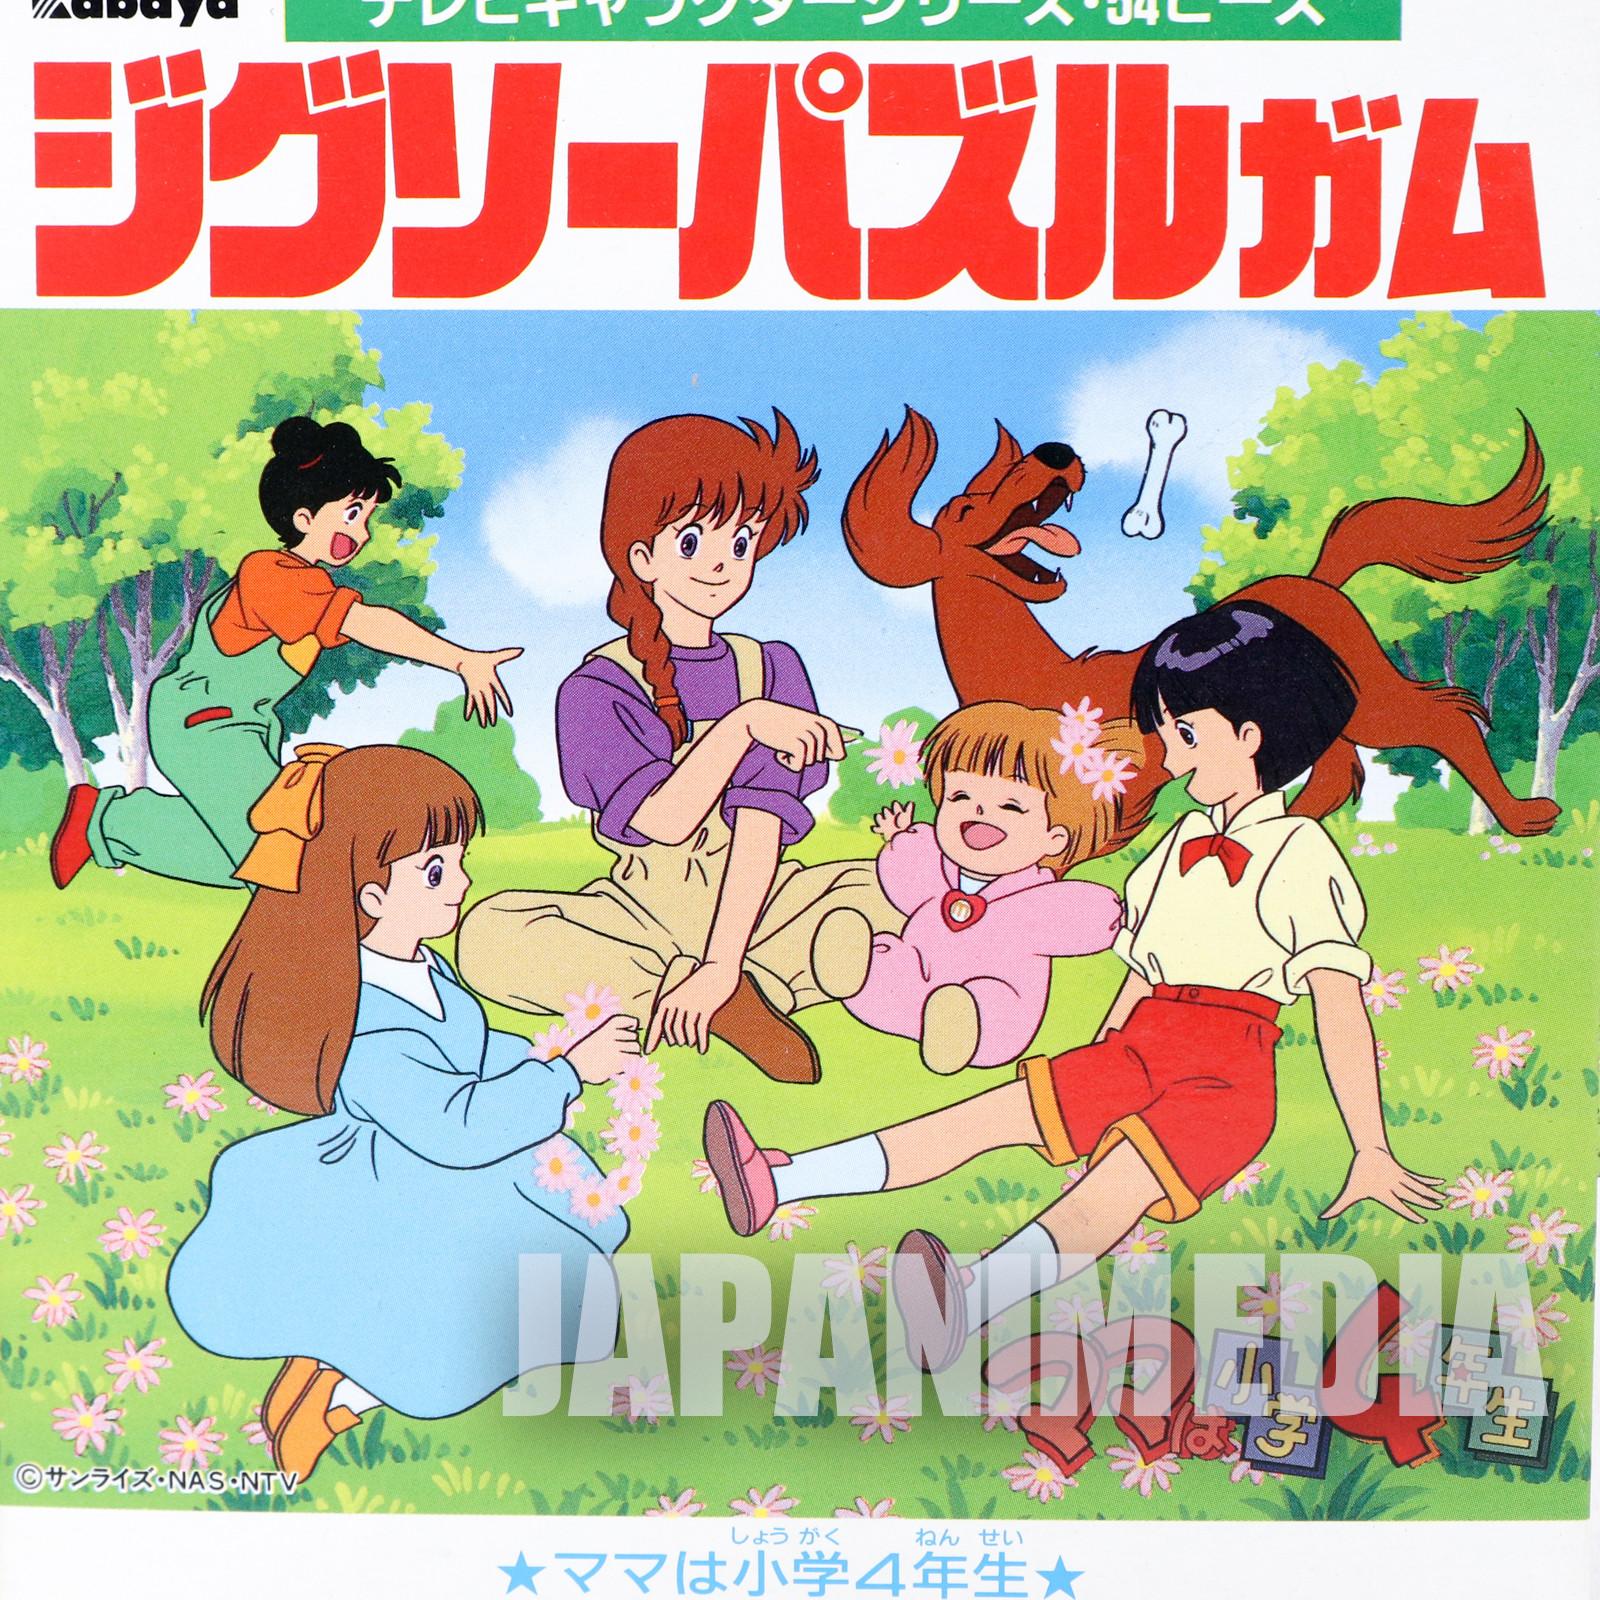 Mama wa Shogaku 4 Nensei Jigsaw Puzzle 18x24cm / 54 Pieces JAPAN ANIME MANGA